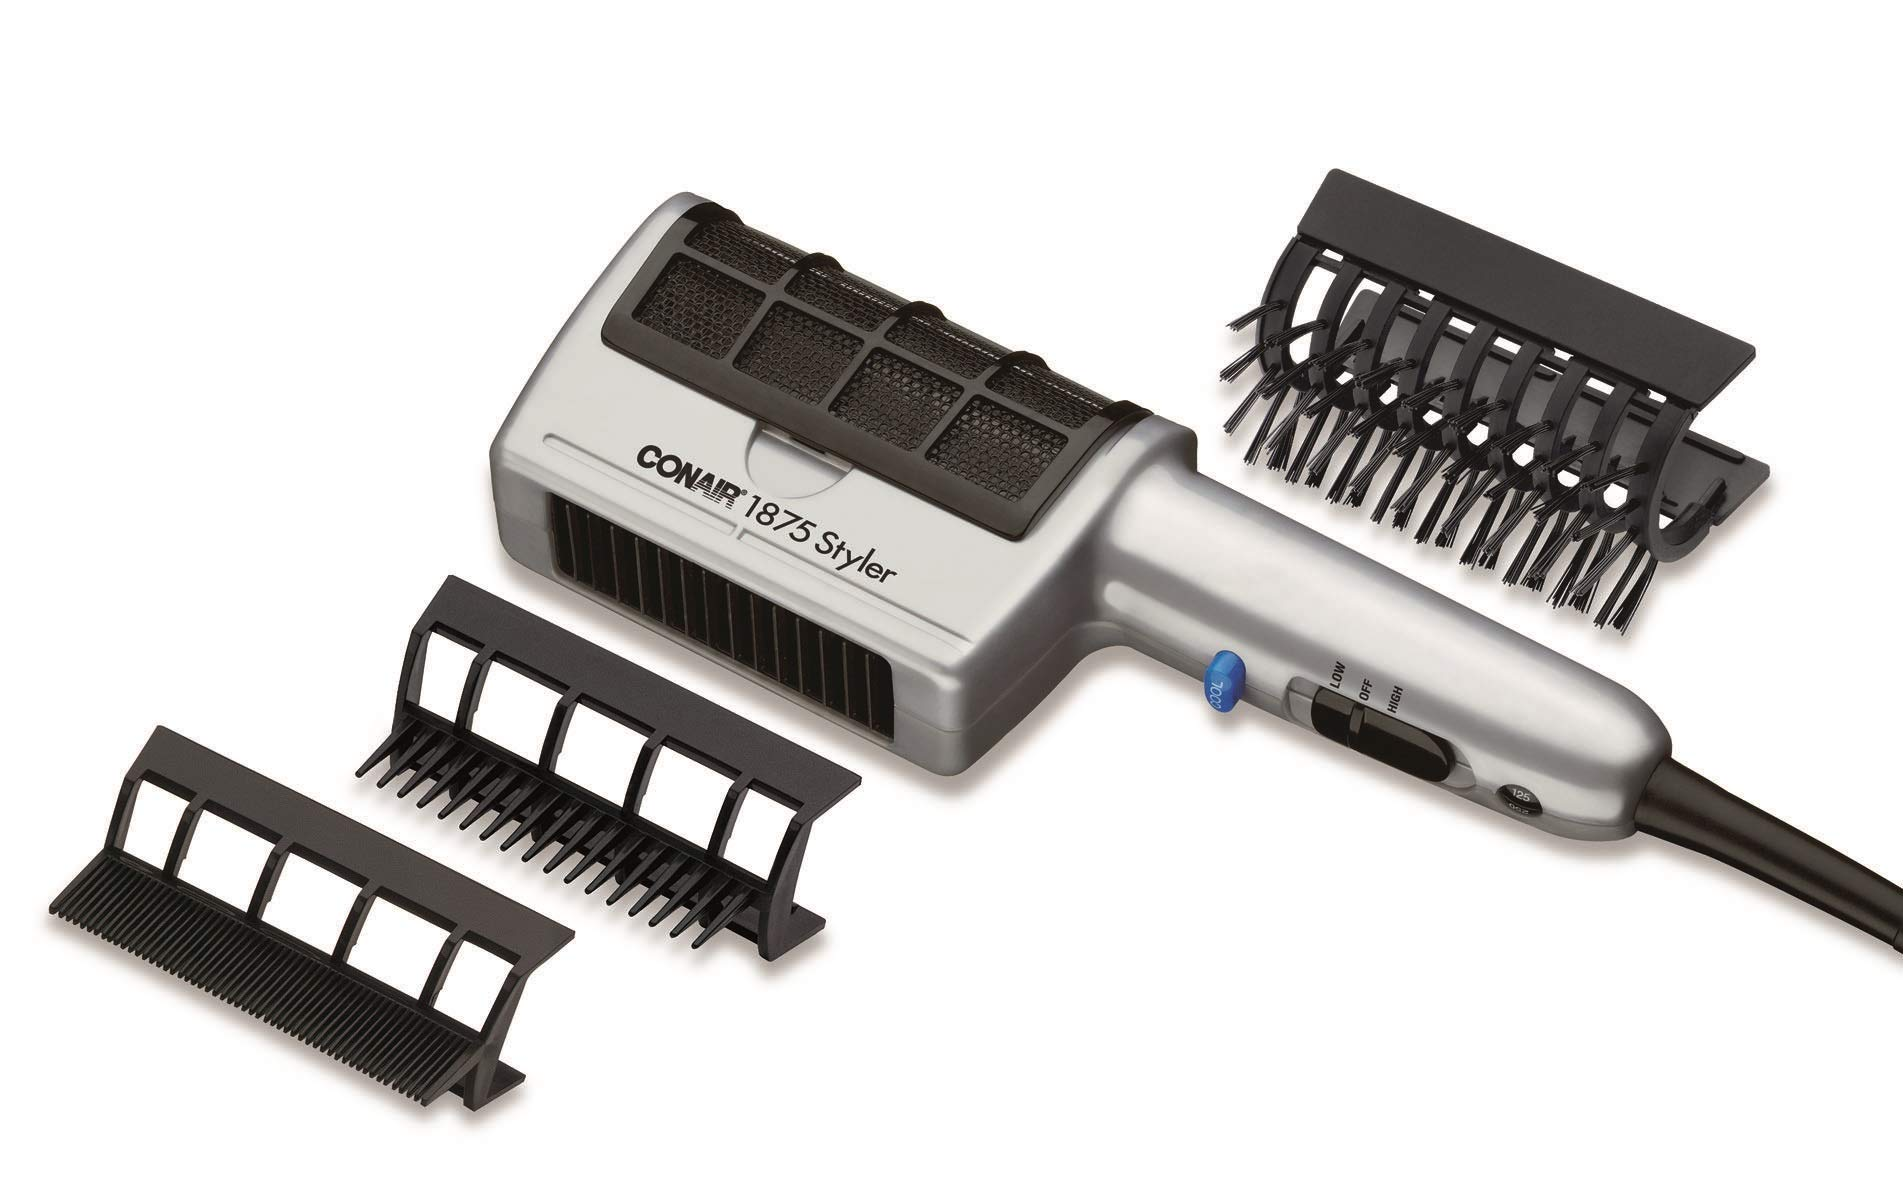 Conair 1875 Watt 3-in-1 Styling Hair Dryer; 3 Attachments to Detangle / Straighten / Volumize by Conair